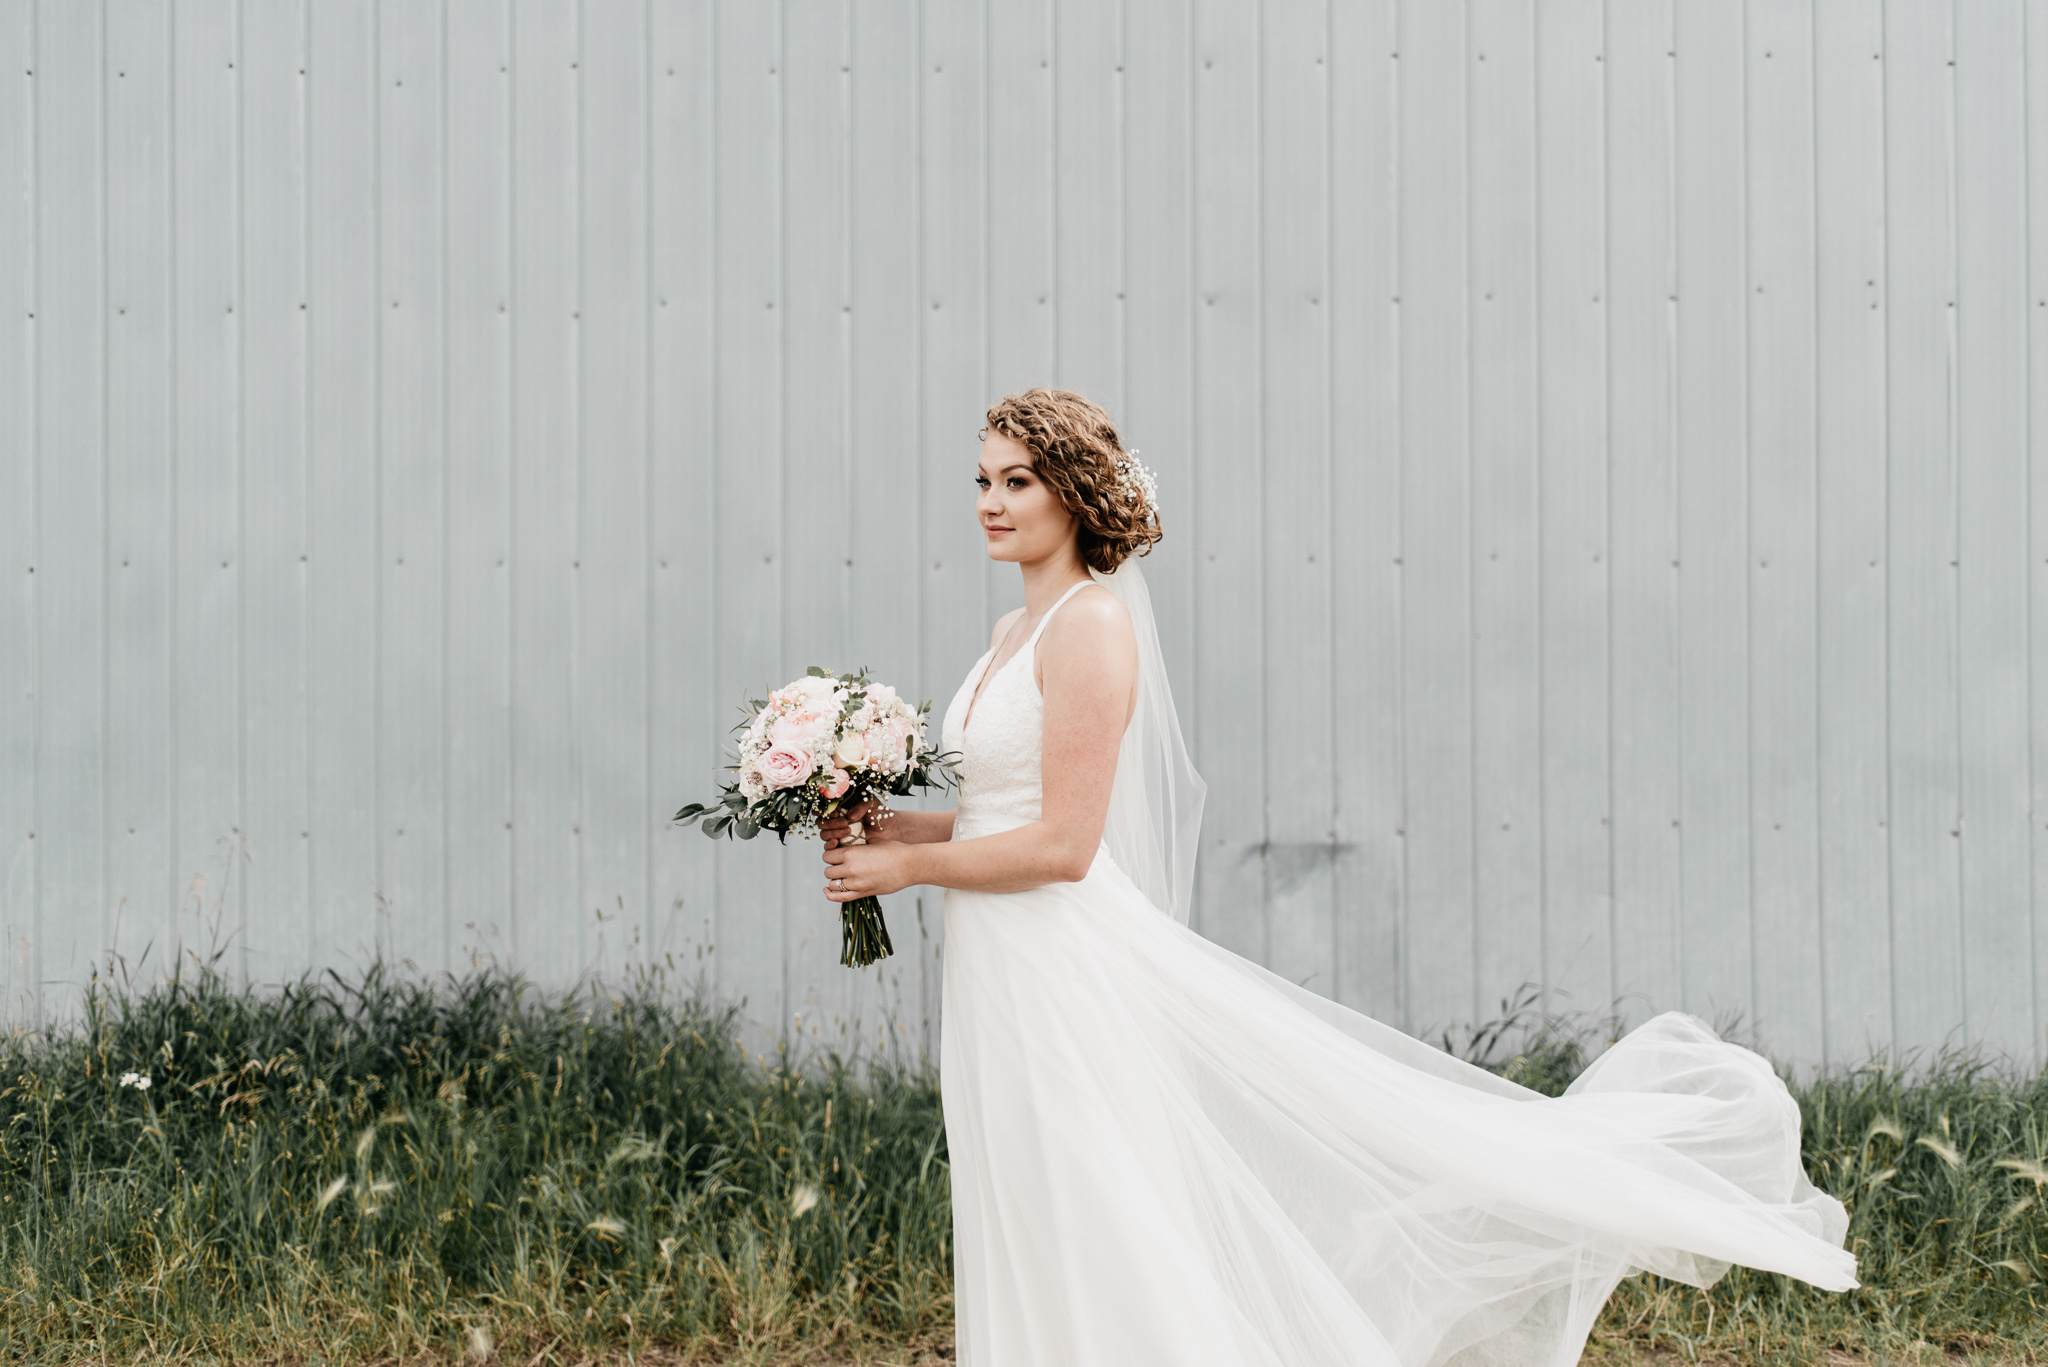 J&C-Weddingblog-57.jpg